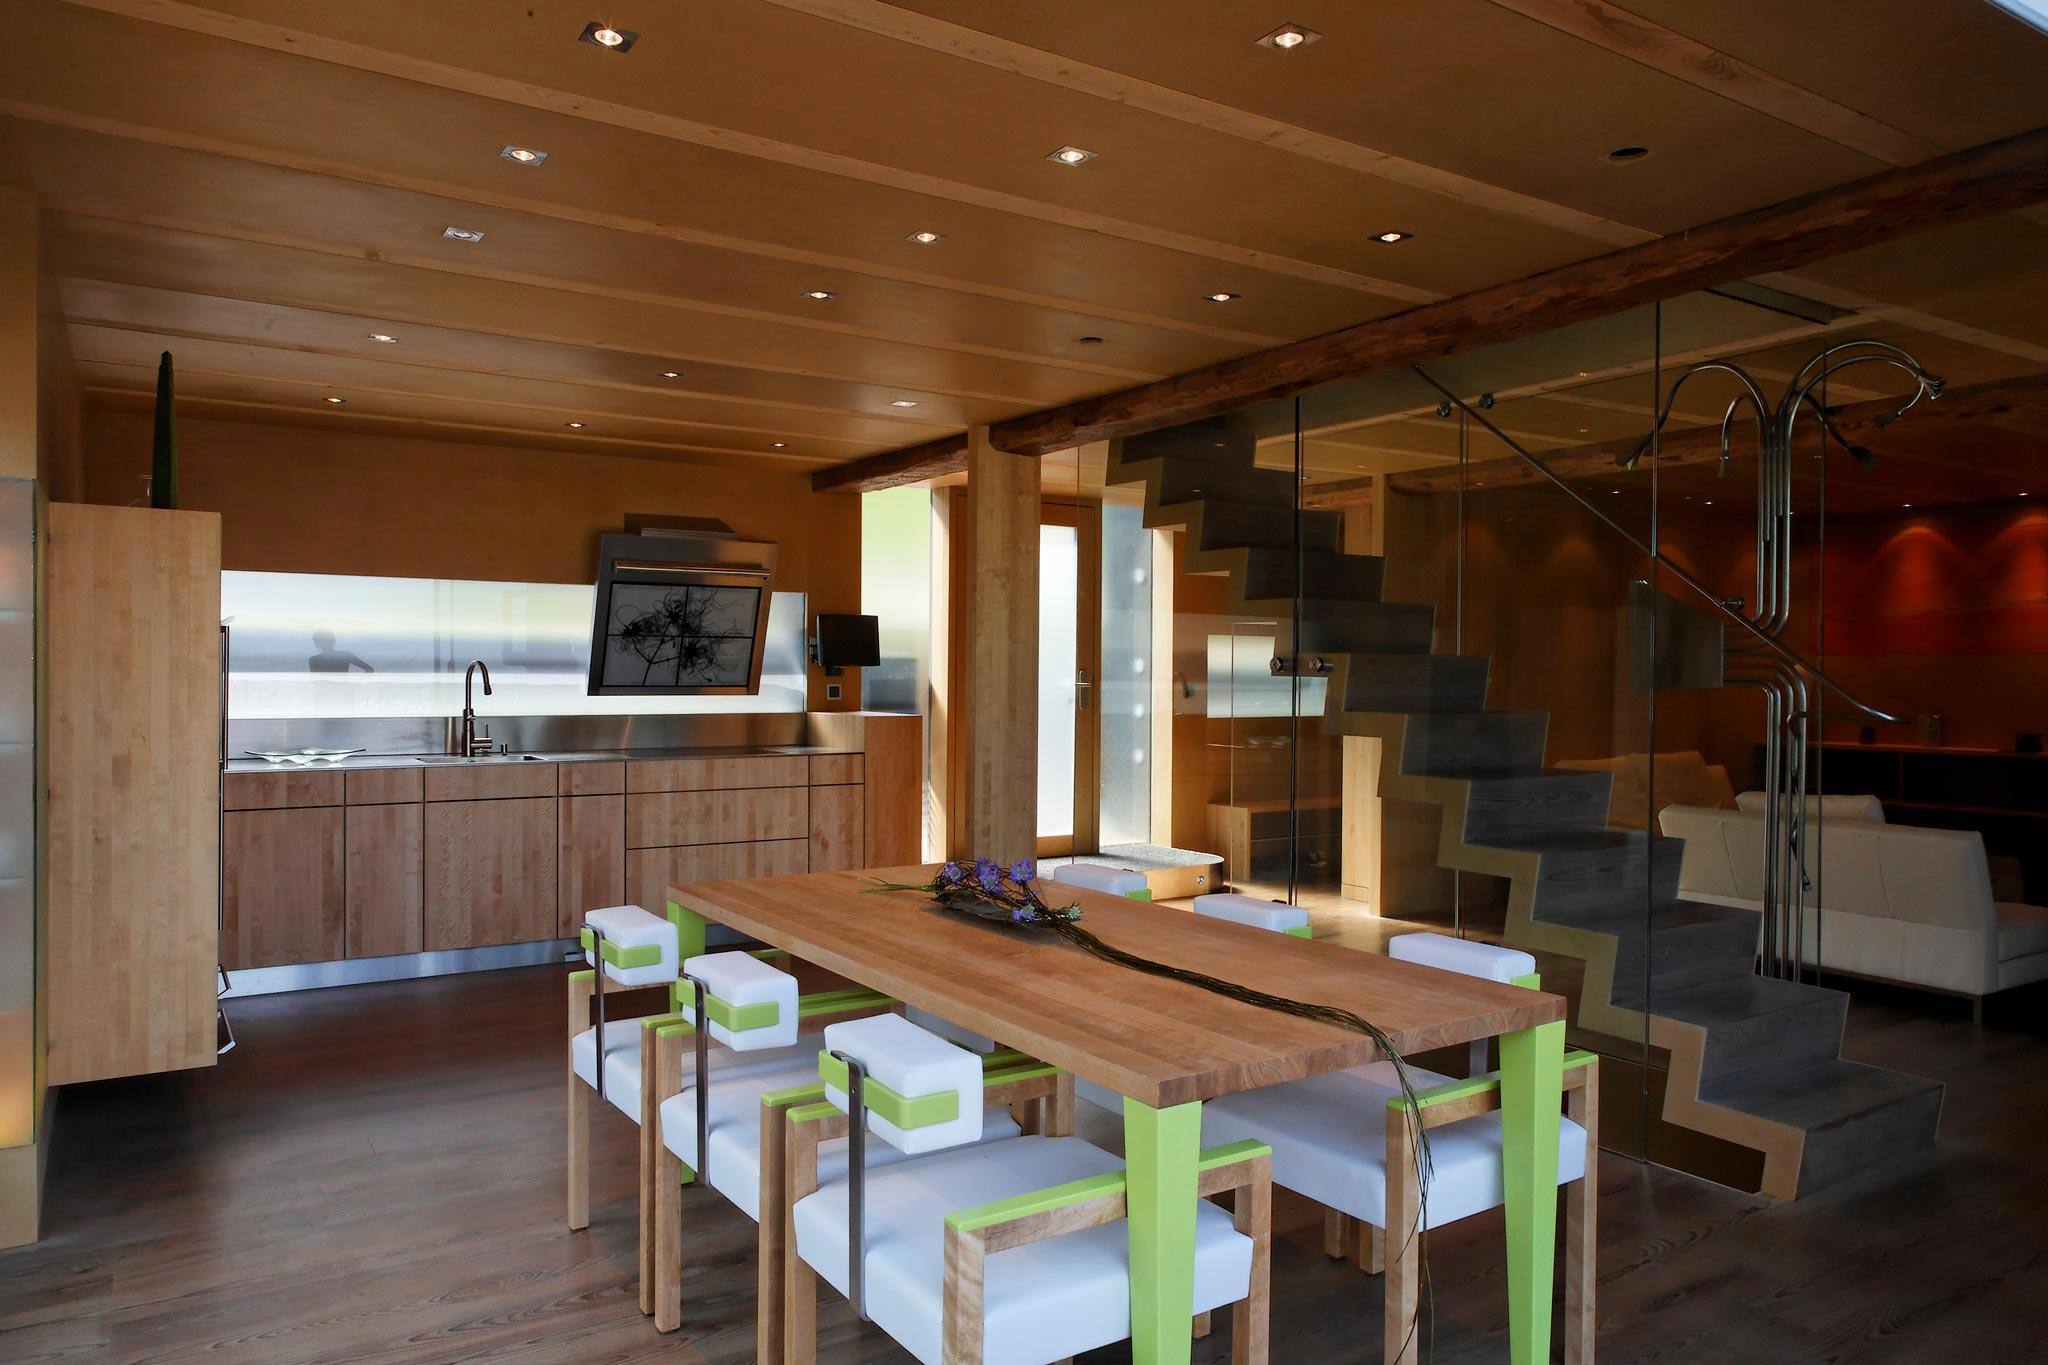 Es Gd Raccard 678 escalierRez hor 20 05 003 - L'escalier du Grand Raccard